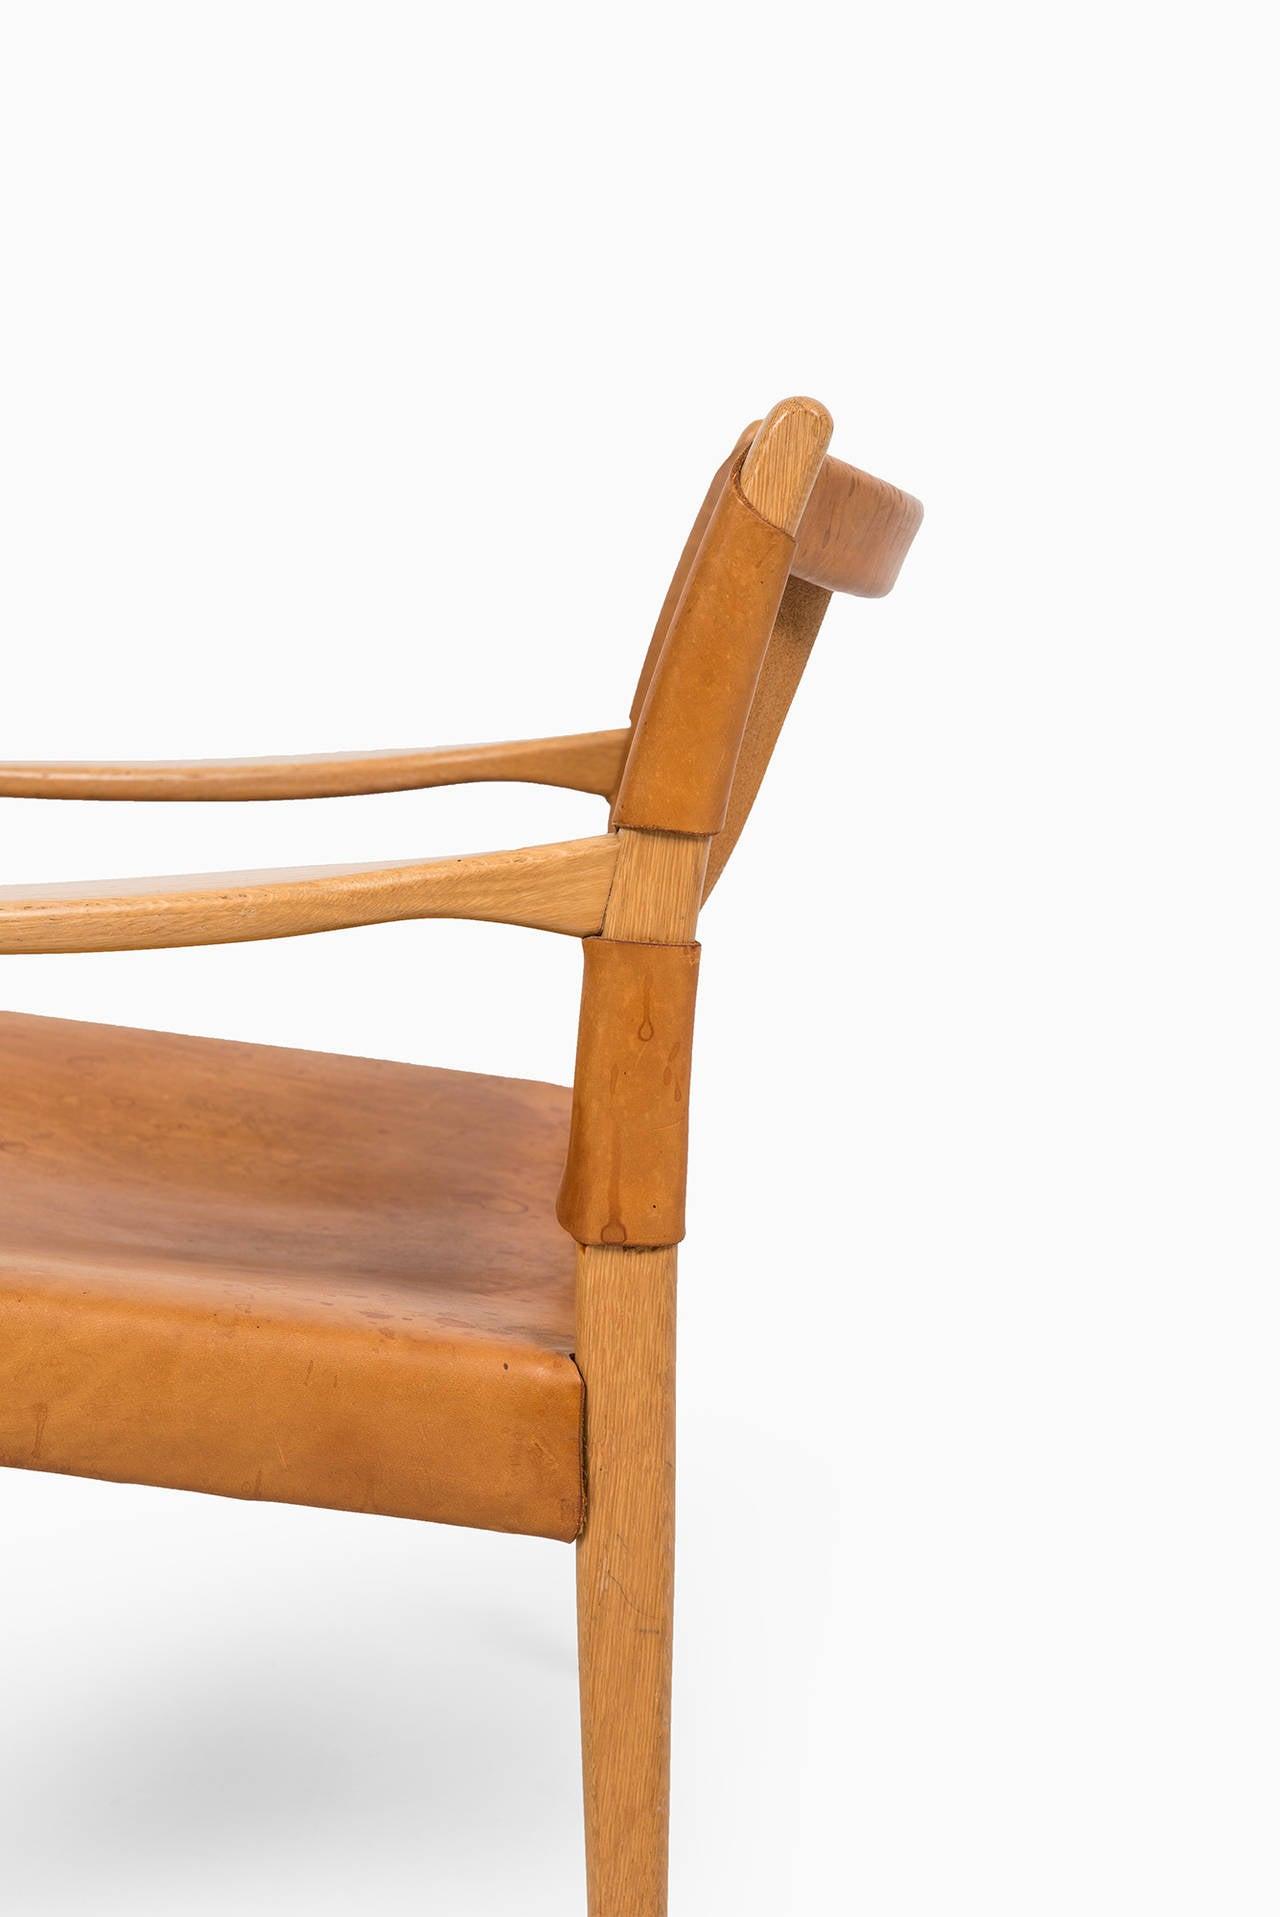 Mid-Century Modern Per-Olof Scotte easy chairs model Premiär produced in Sweden